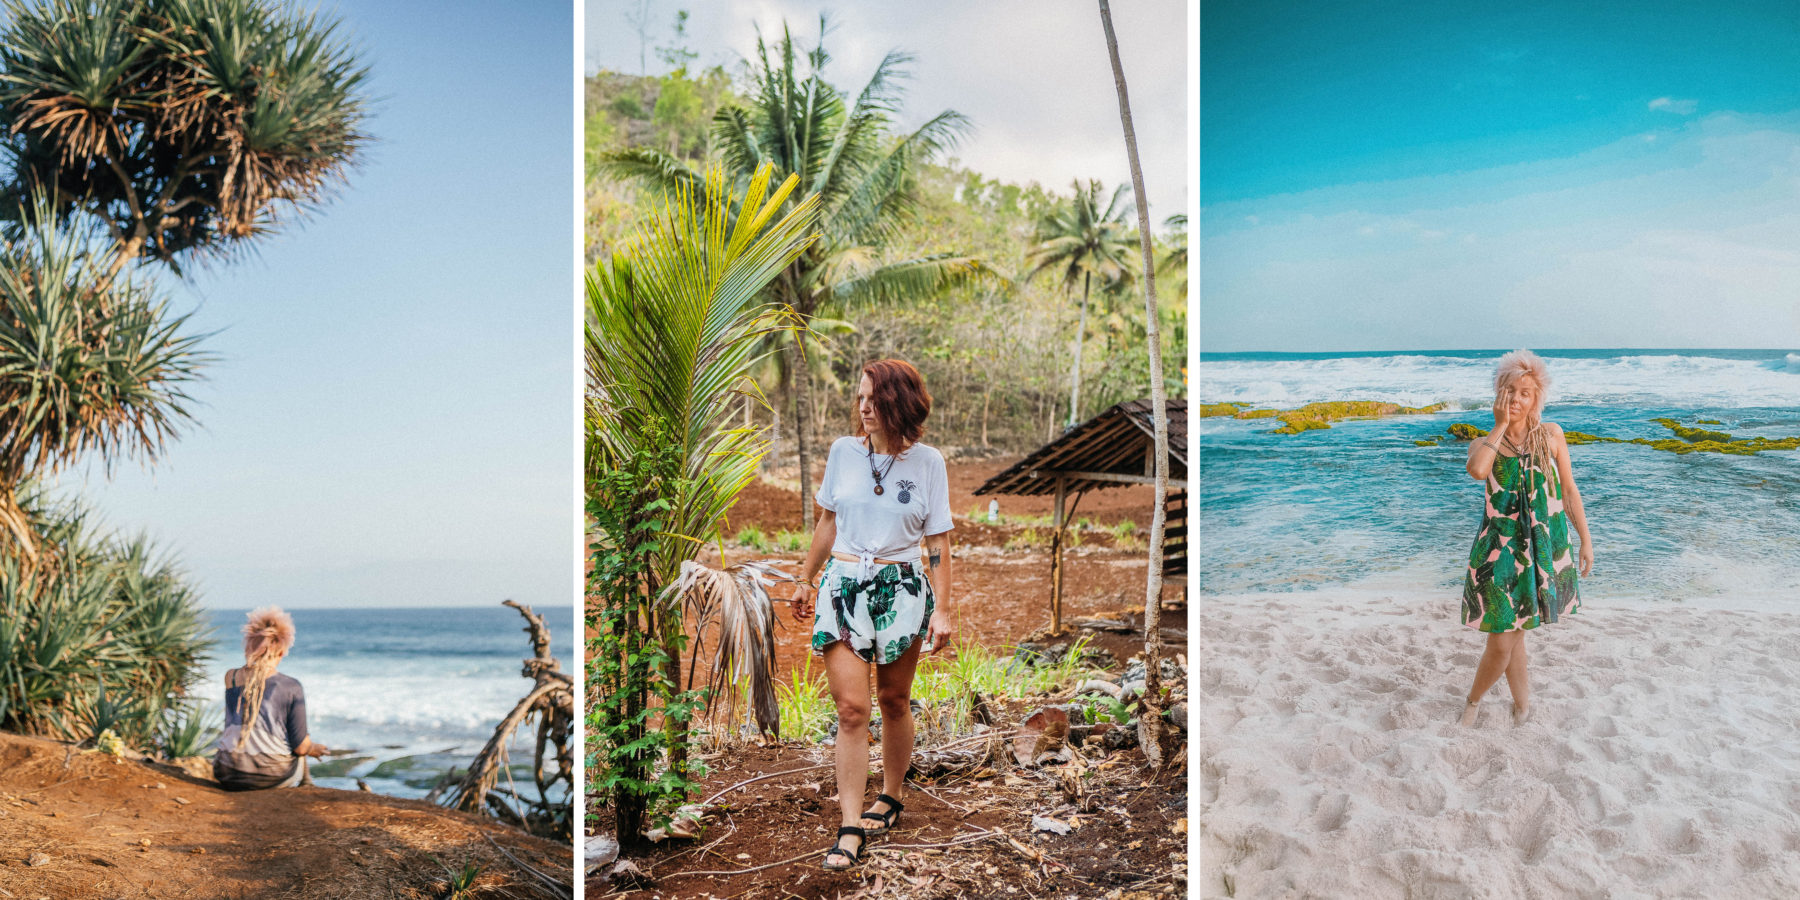 indonesia pantai drini beach getaway on scooter exploring java yogyakarta